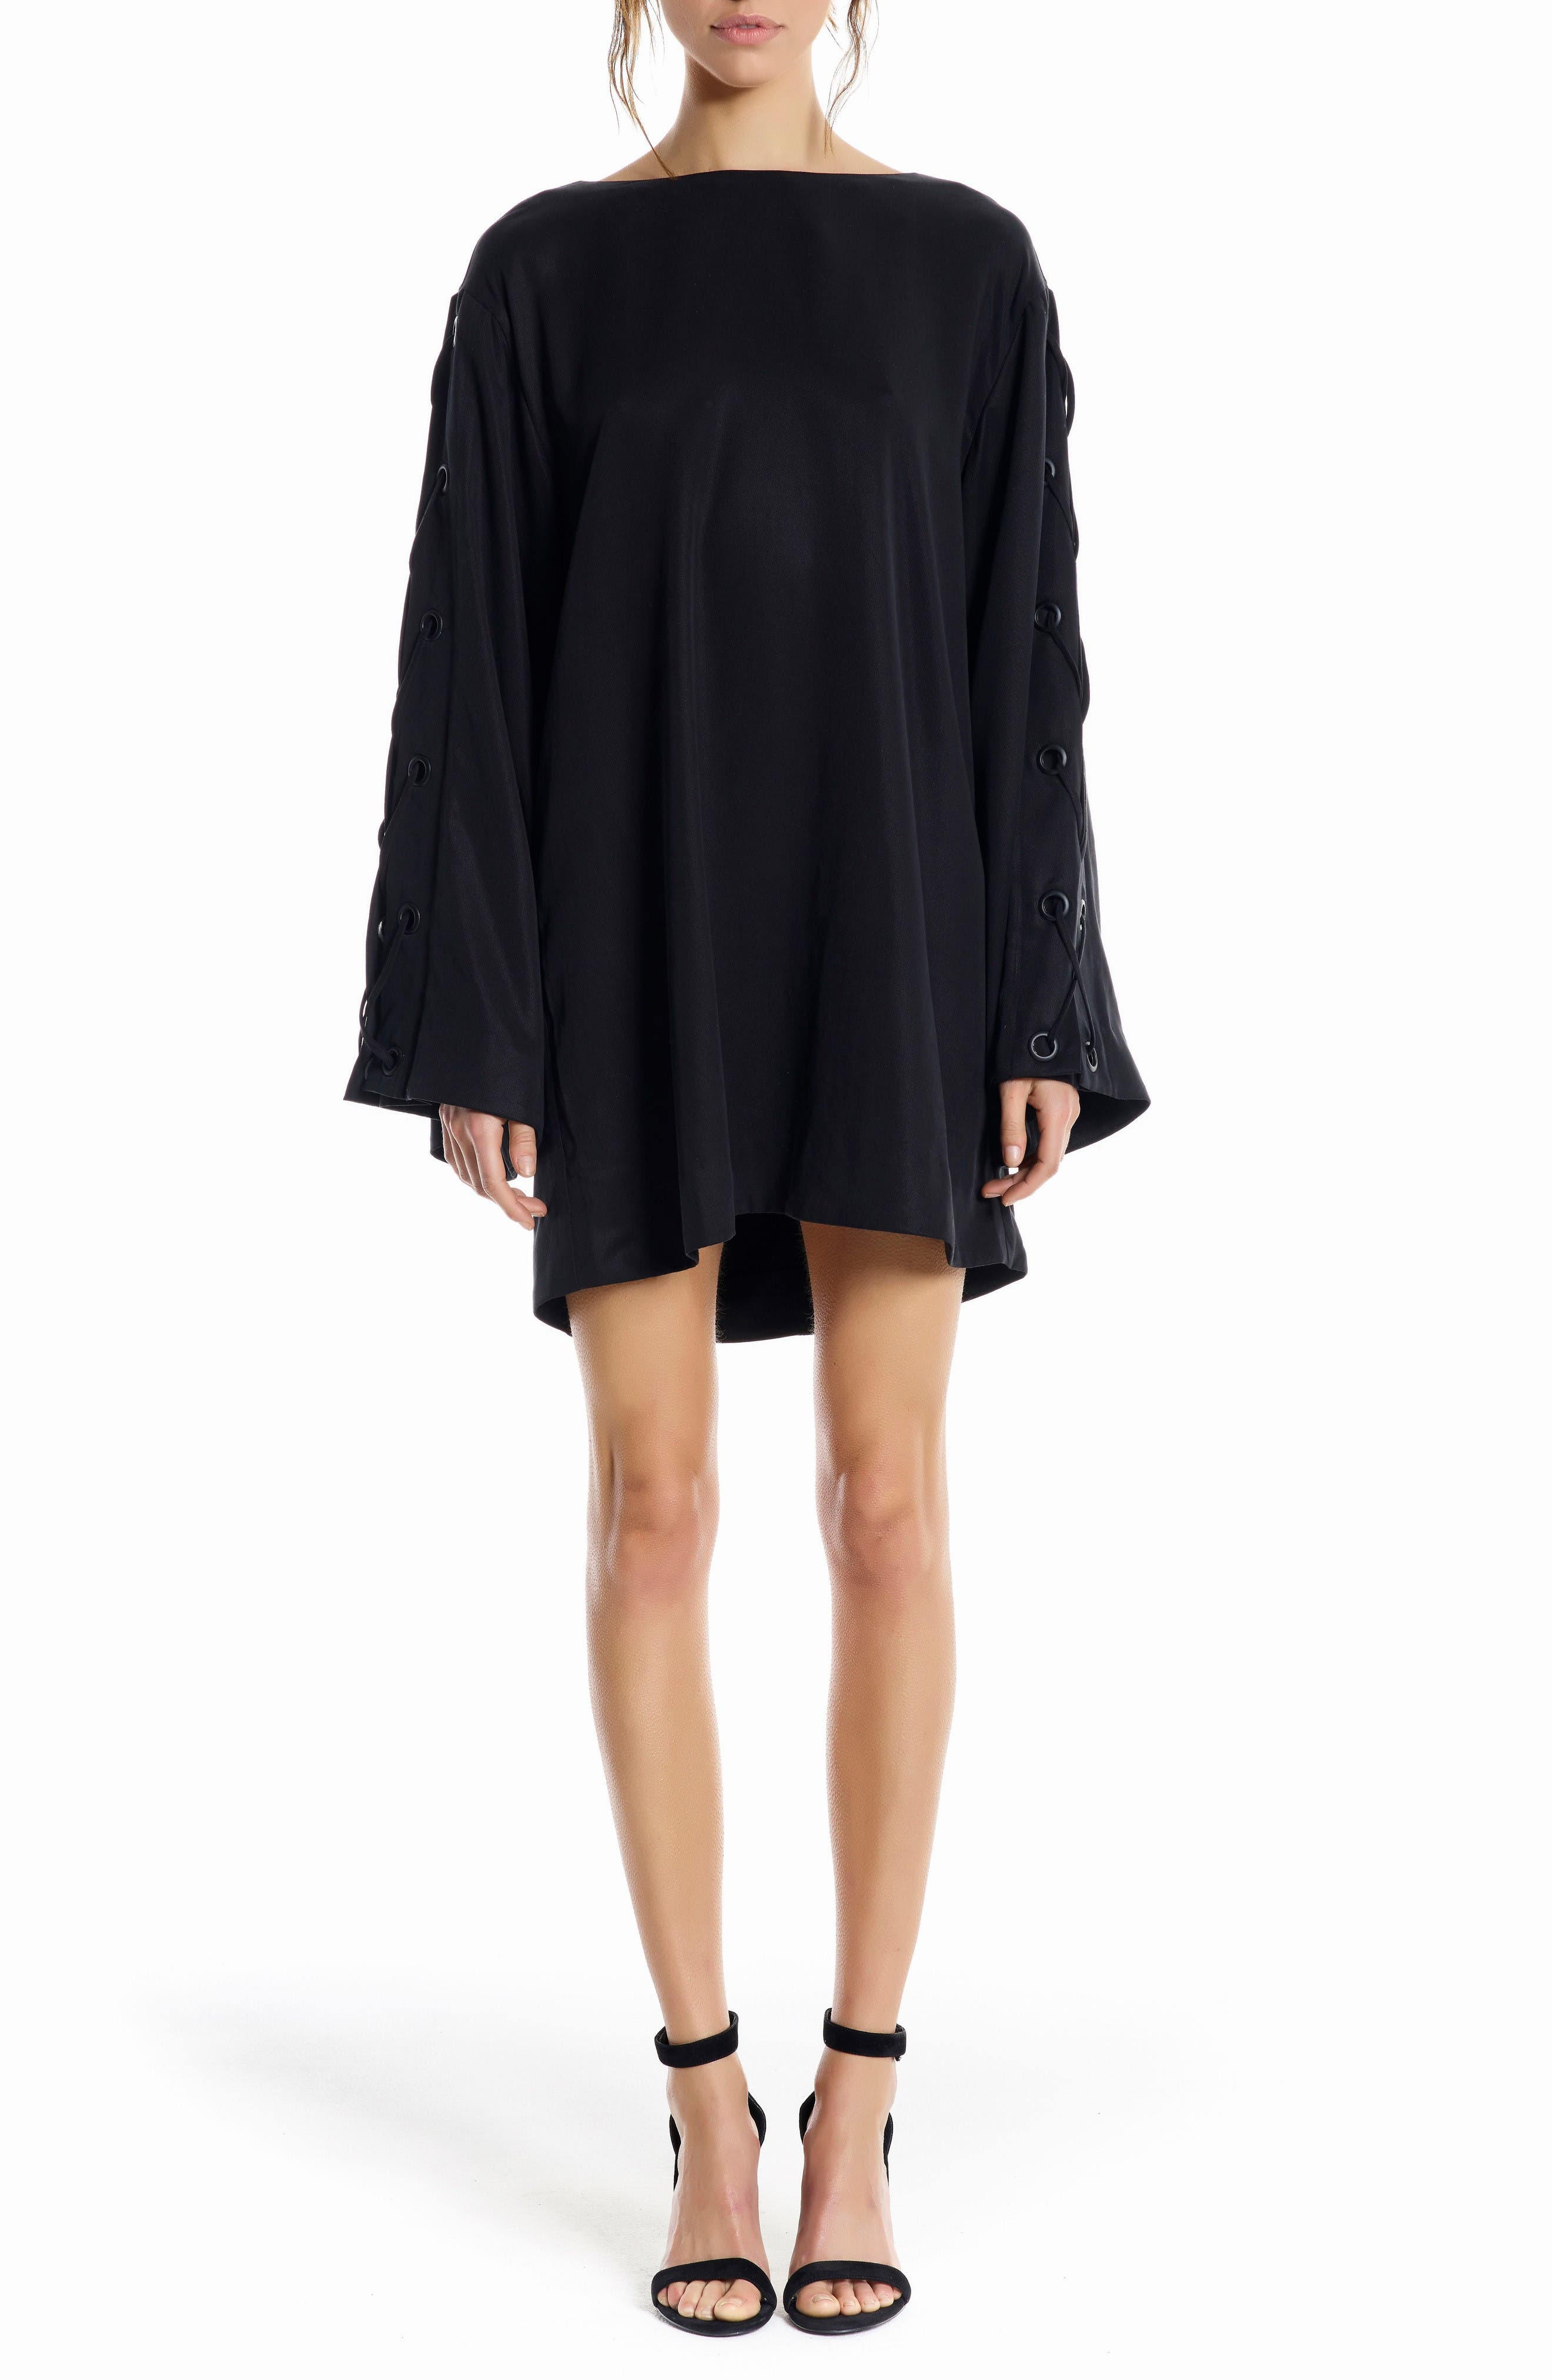 Alternate Image 1 Selected - KENDALL + KYLIE Bell Sleeve Minidress